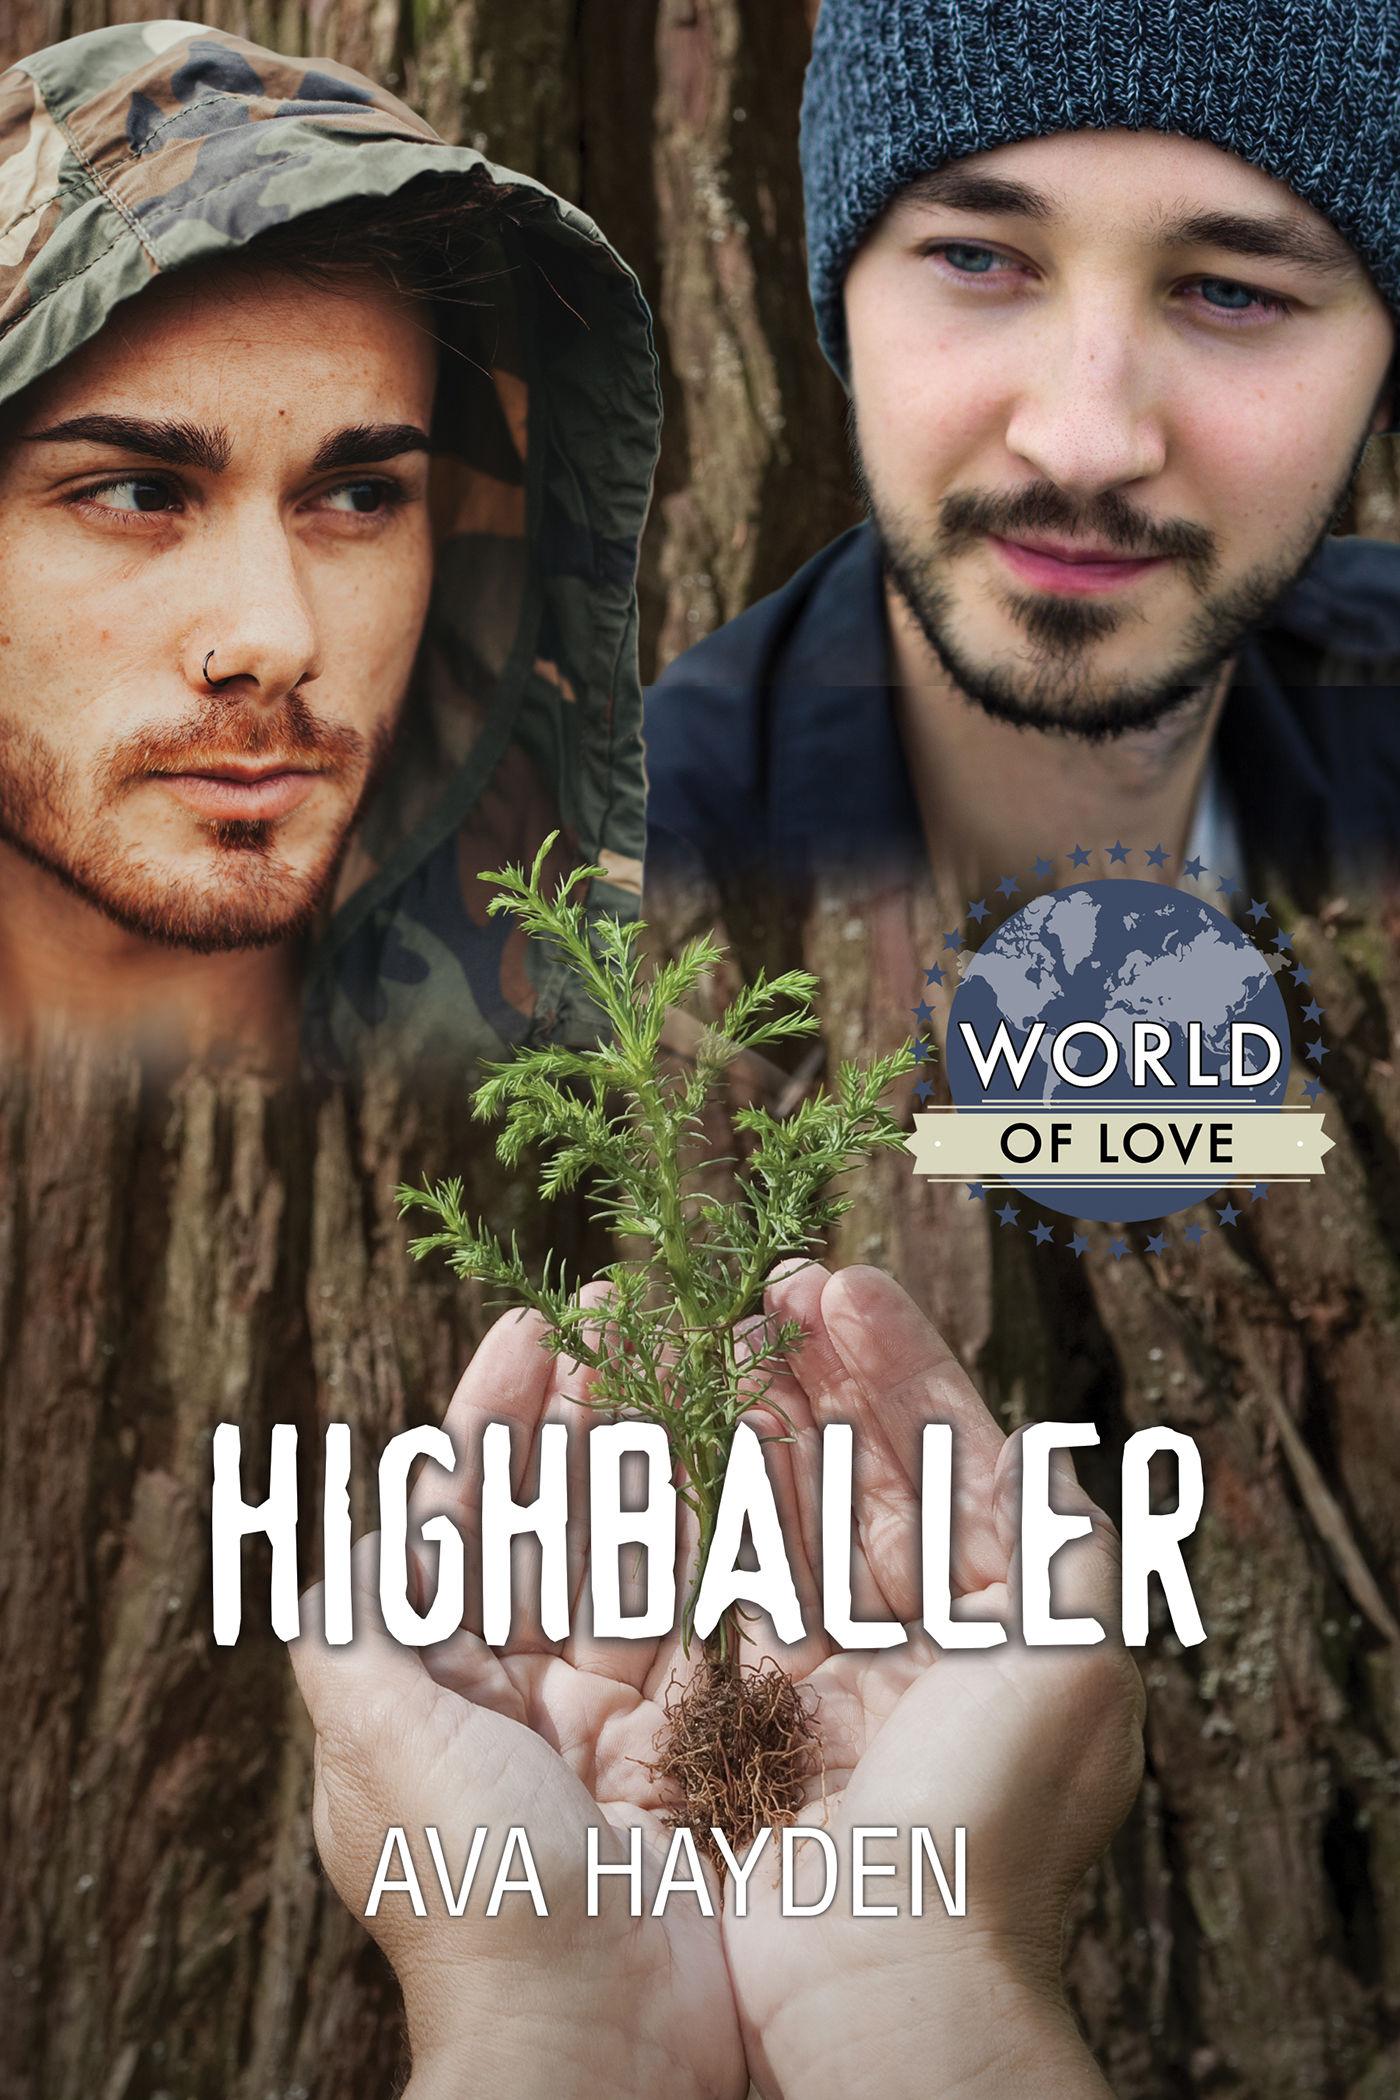 Review: Highballer by Ava Hayden